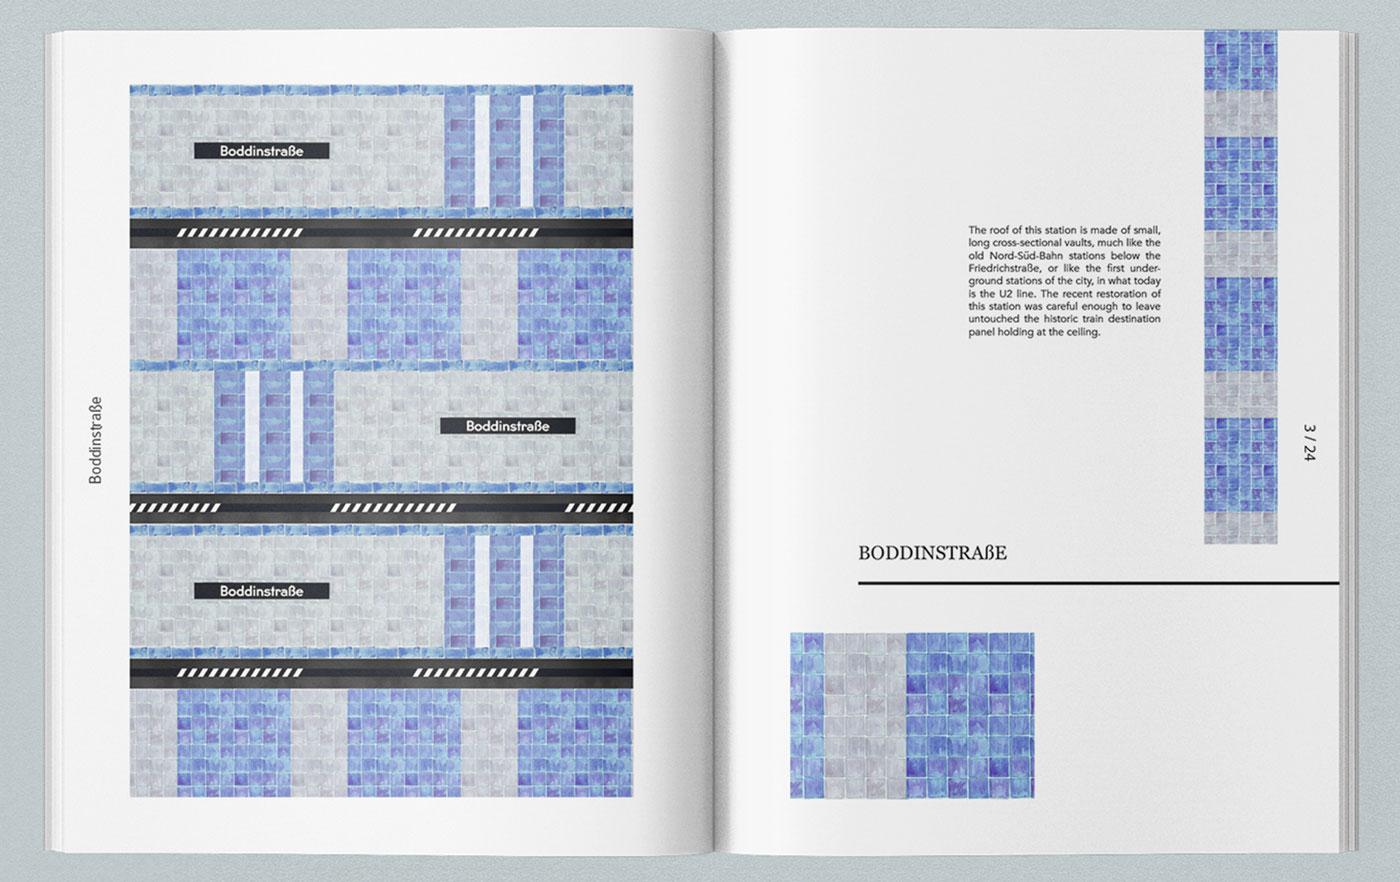 magazine_insides_pages-mockup-2.jpg